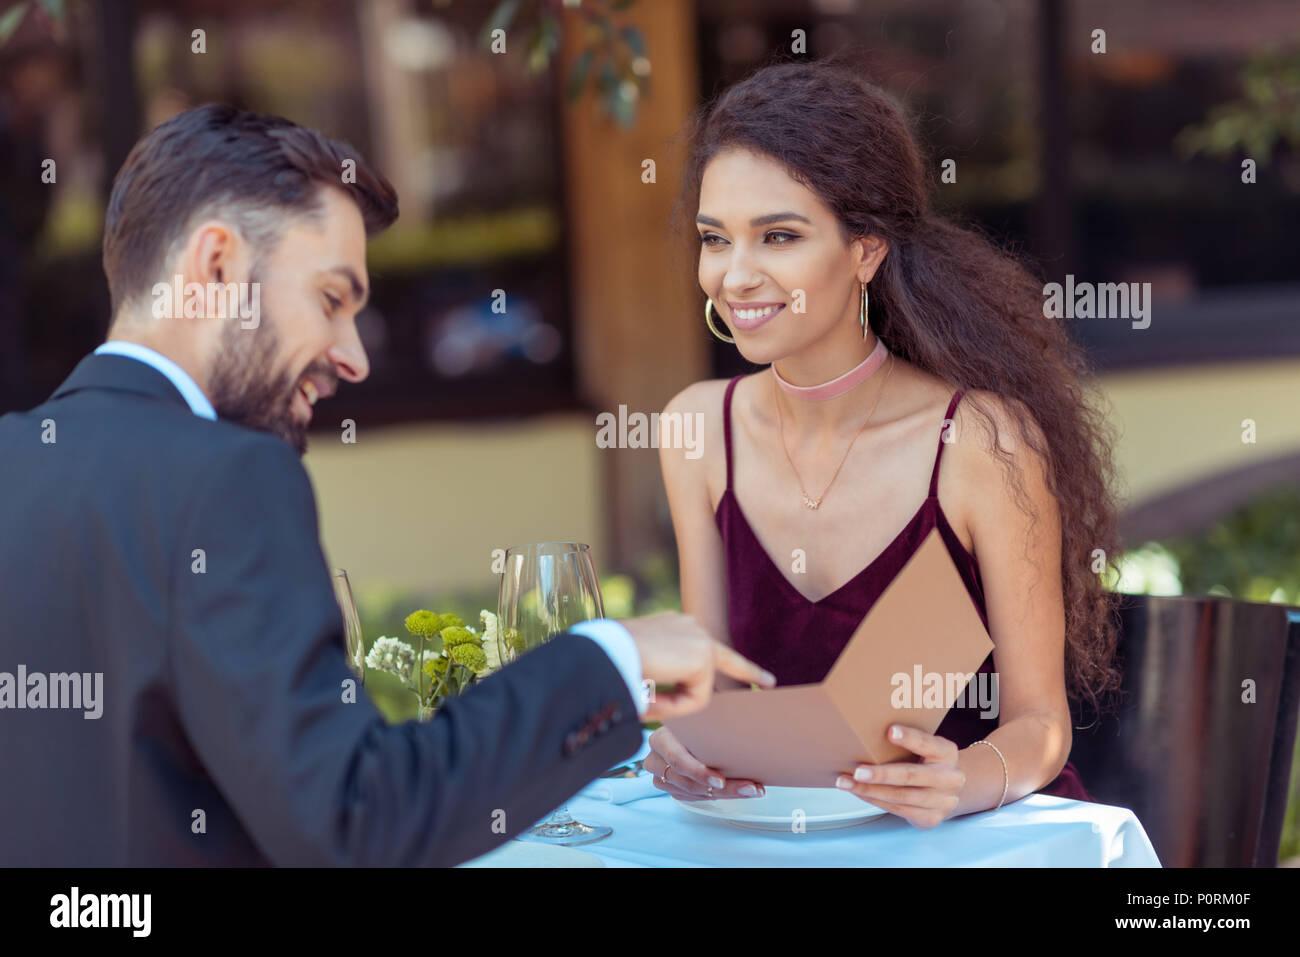 Couple having romantic date in restaurant, choosing meal in menu Stock Photo